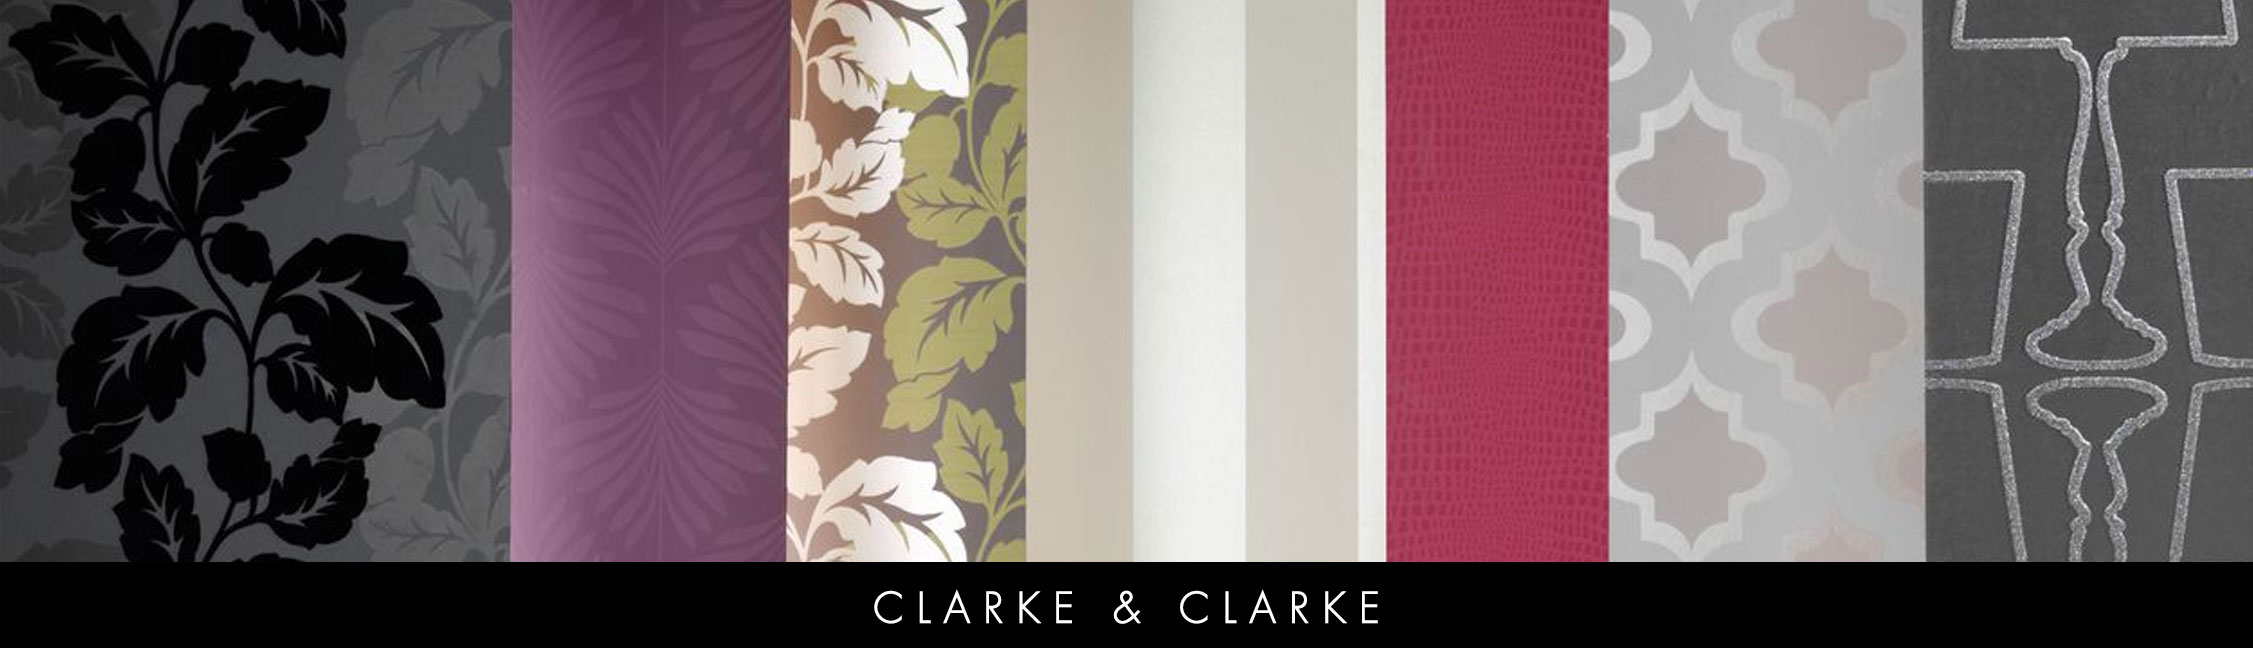 clarkeclarke-banner